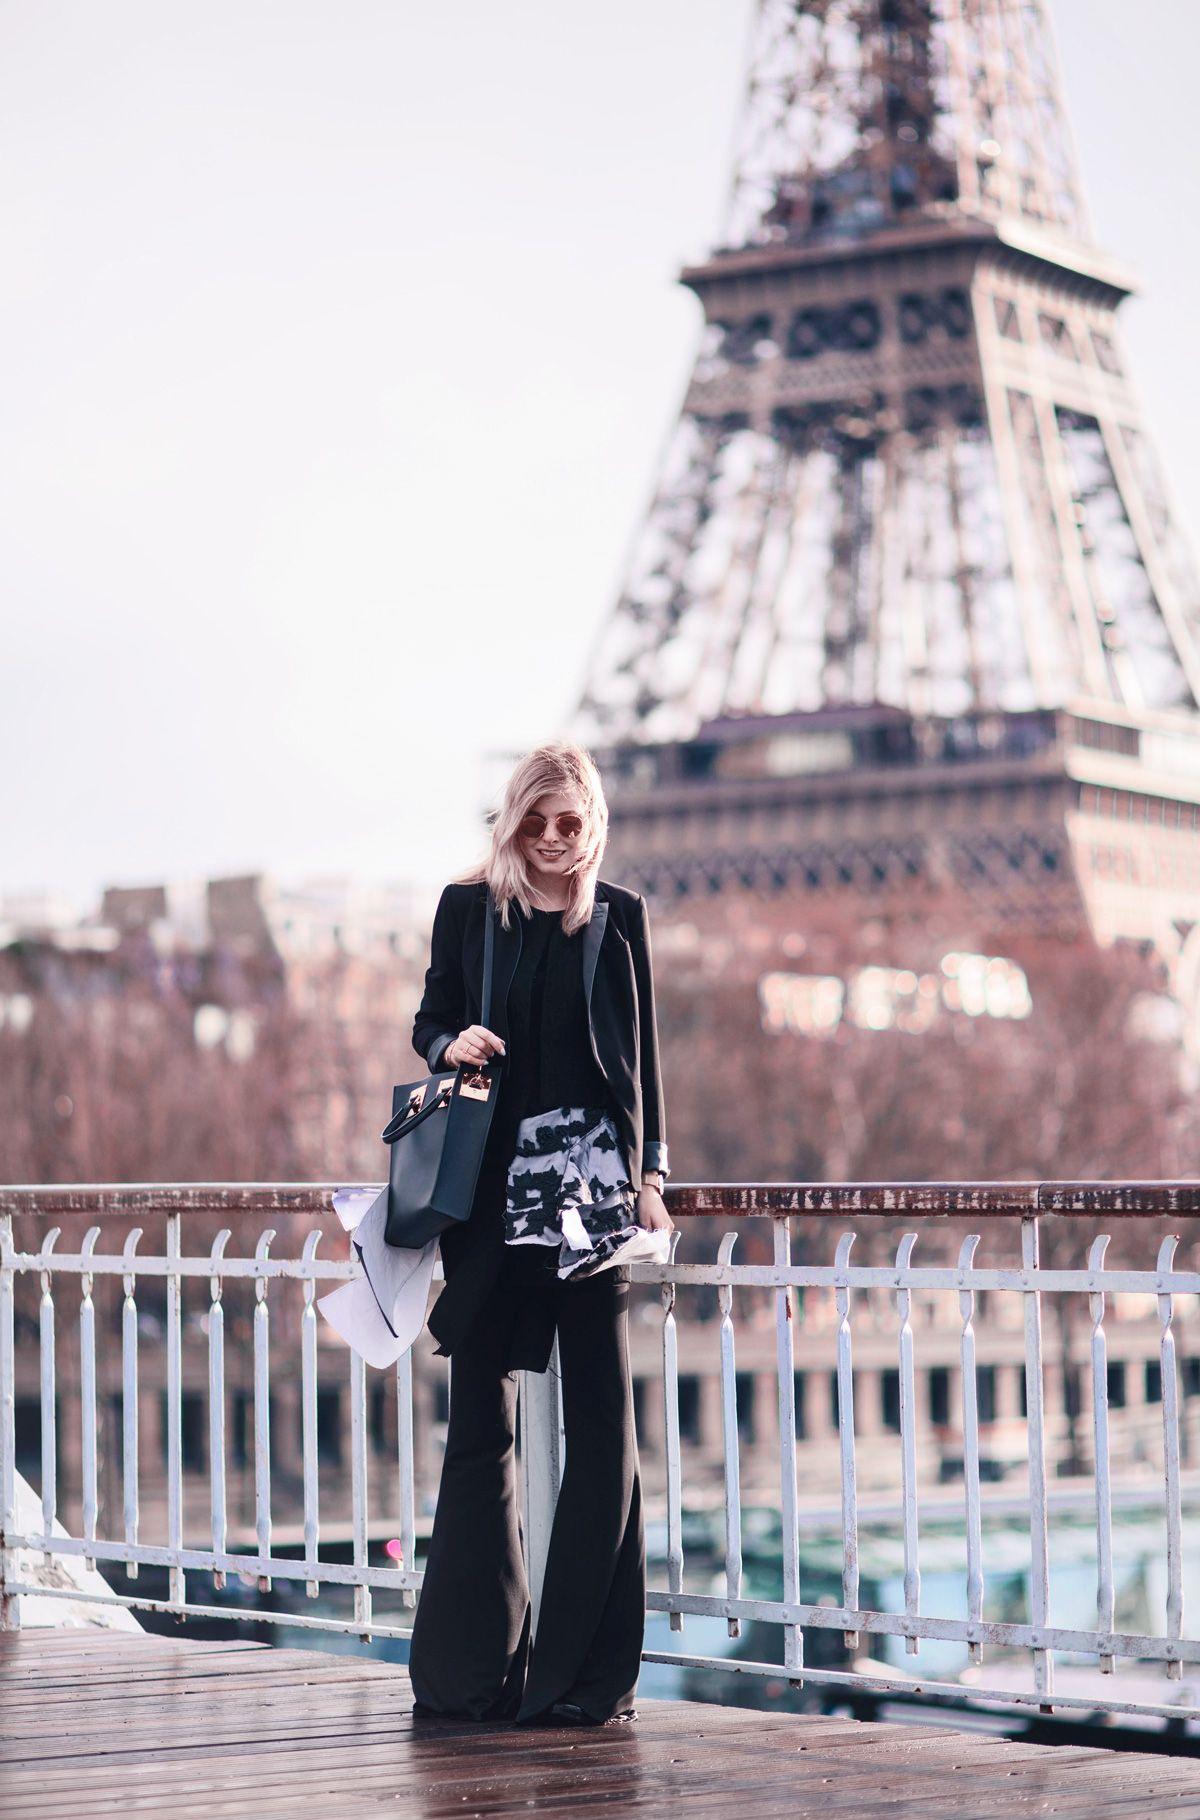 blazer*: Guess trousers*: Guess top*: Guy Laroche bag*: Sophie Hulme via Shopbop sunnies*: Ray-Ban Wenn man schon in Paris…